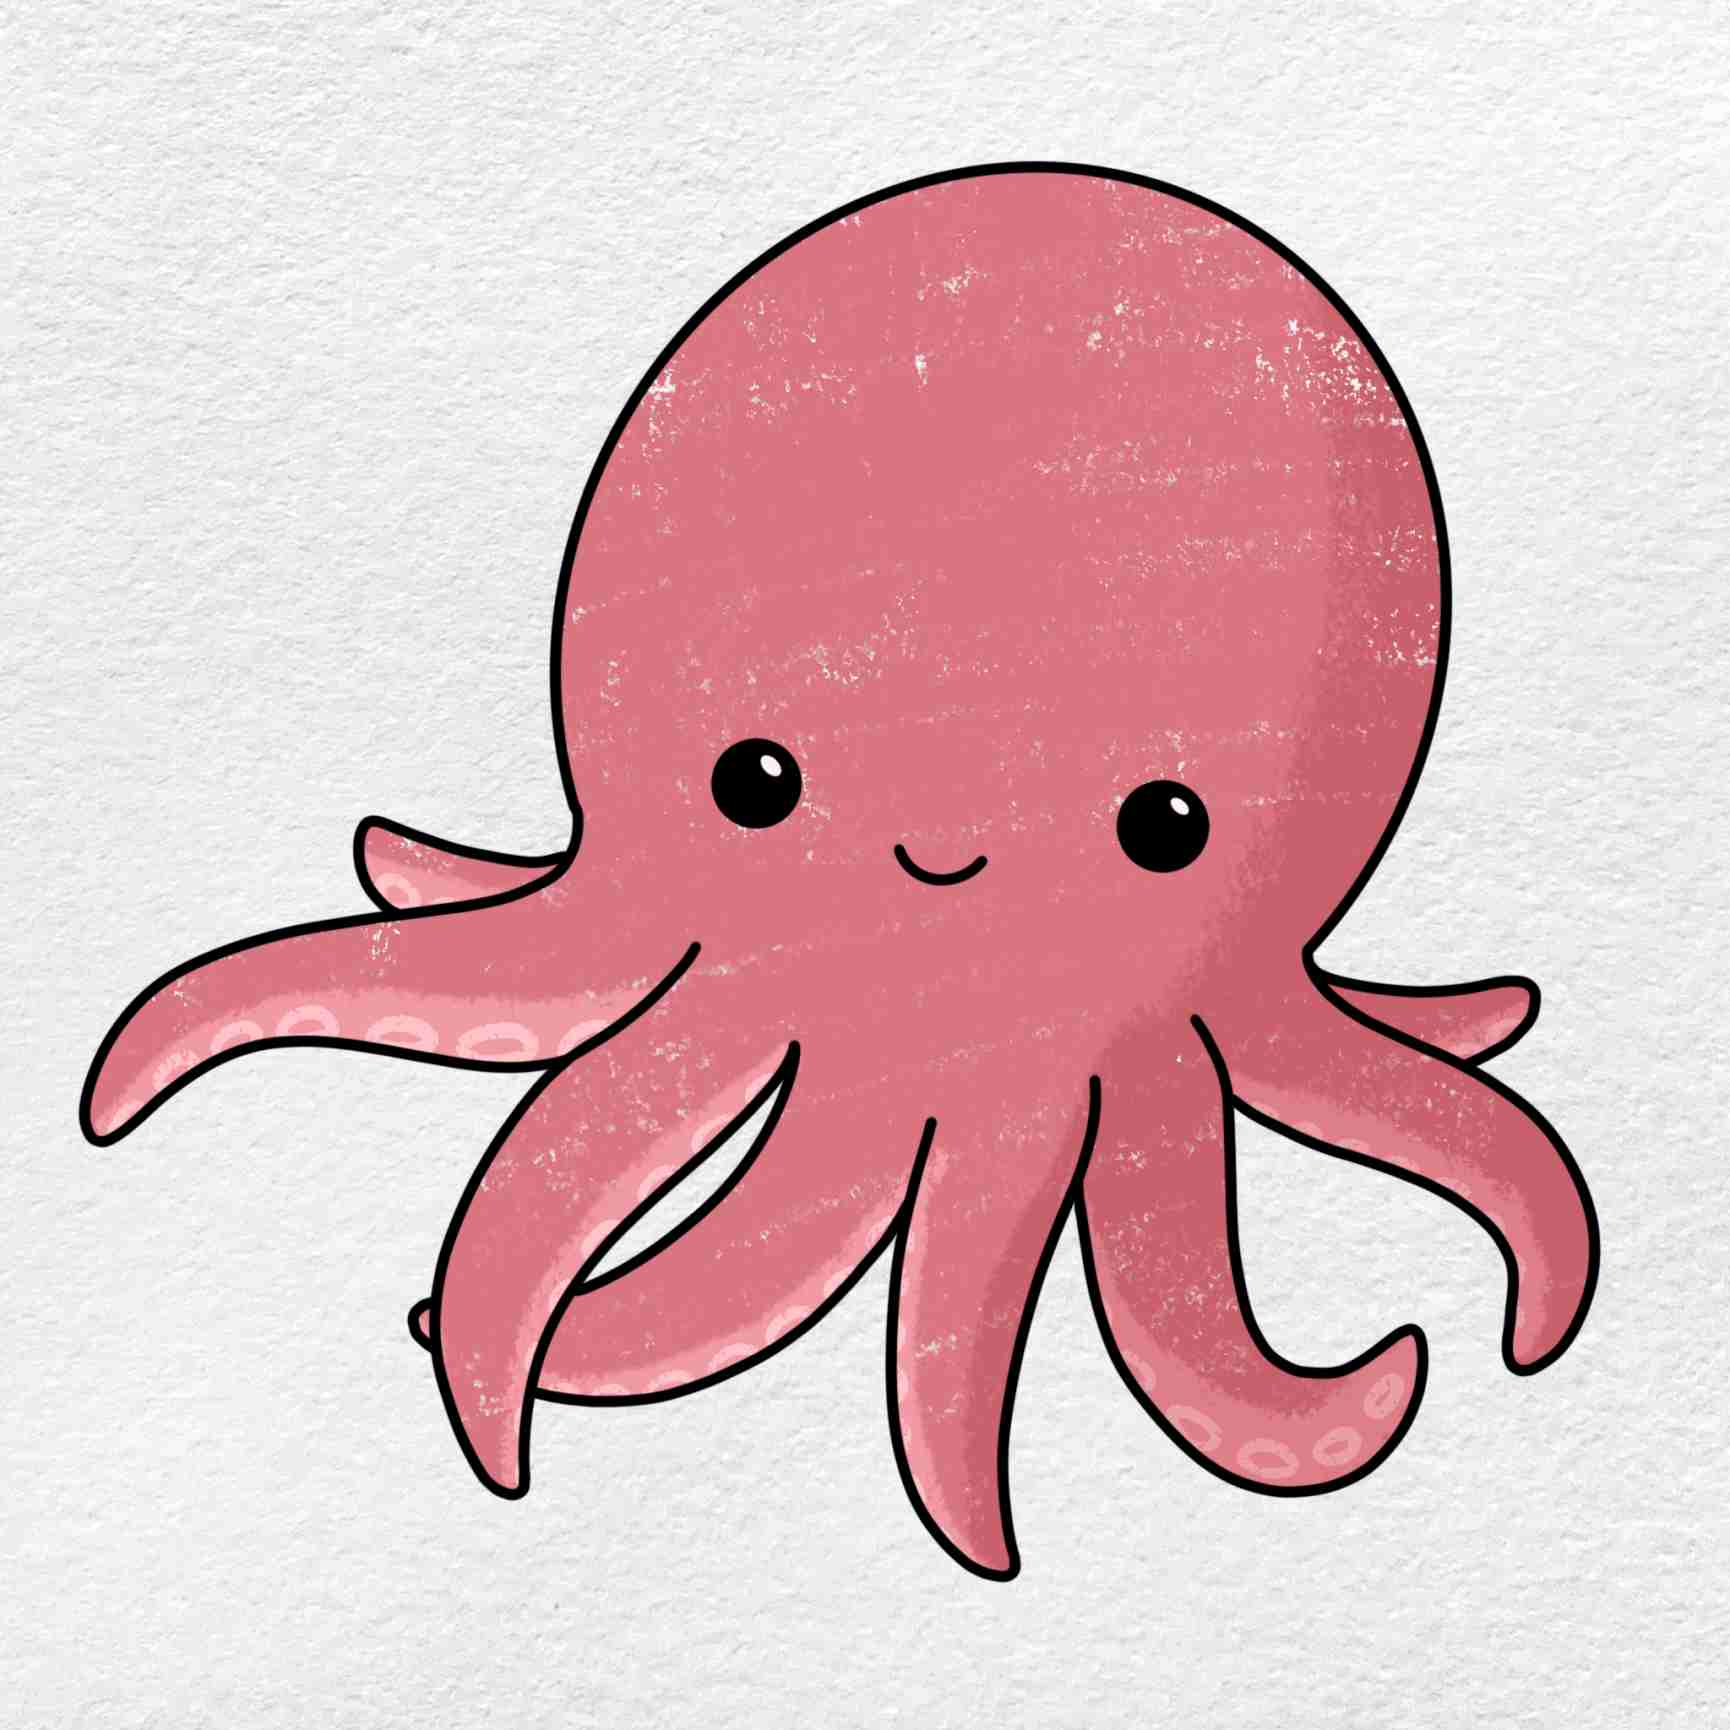 Cute Octopus Drawing: Step 6